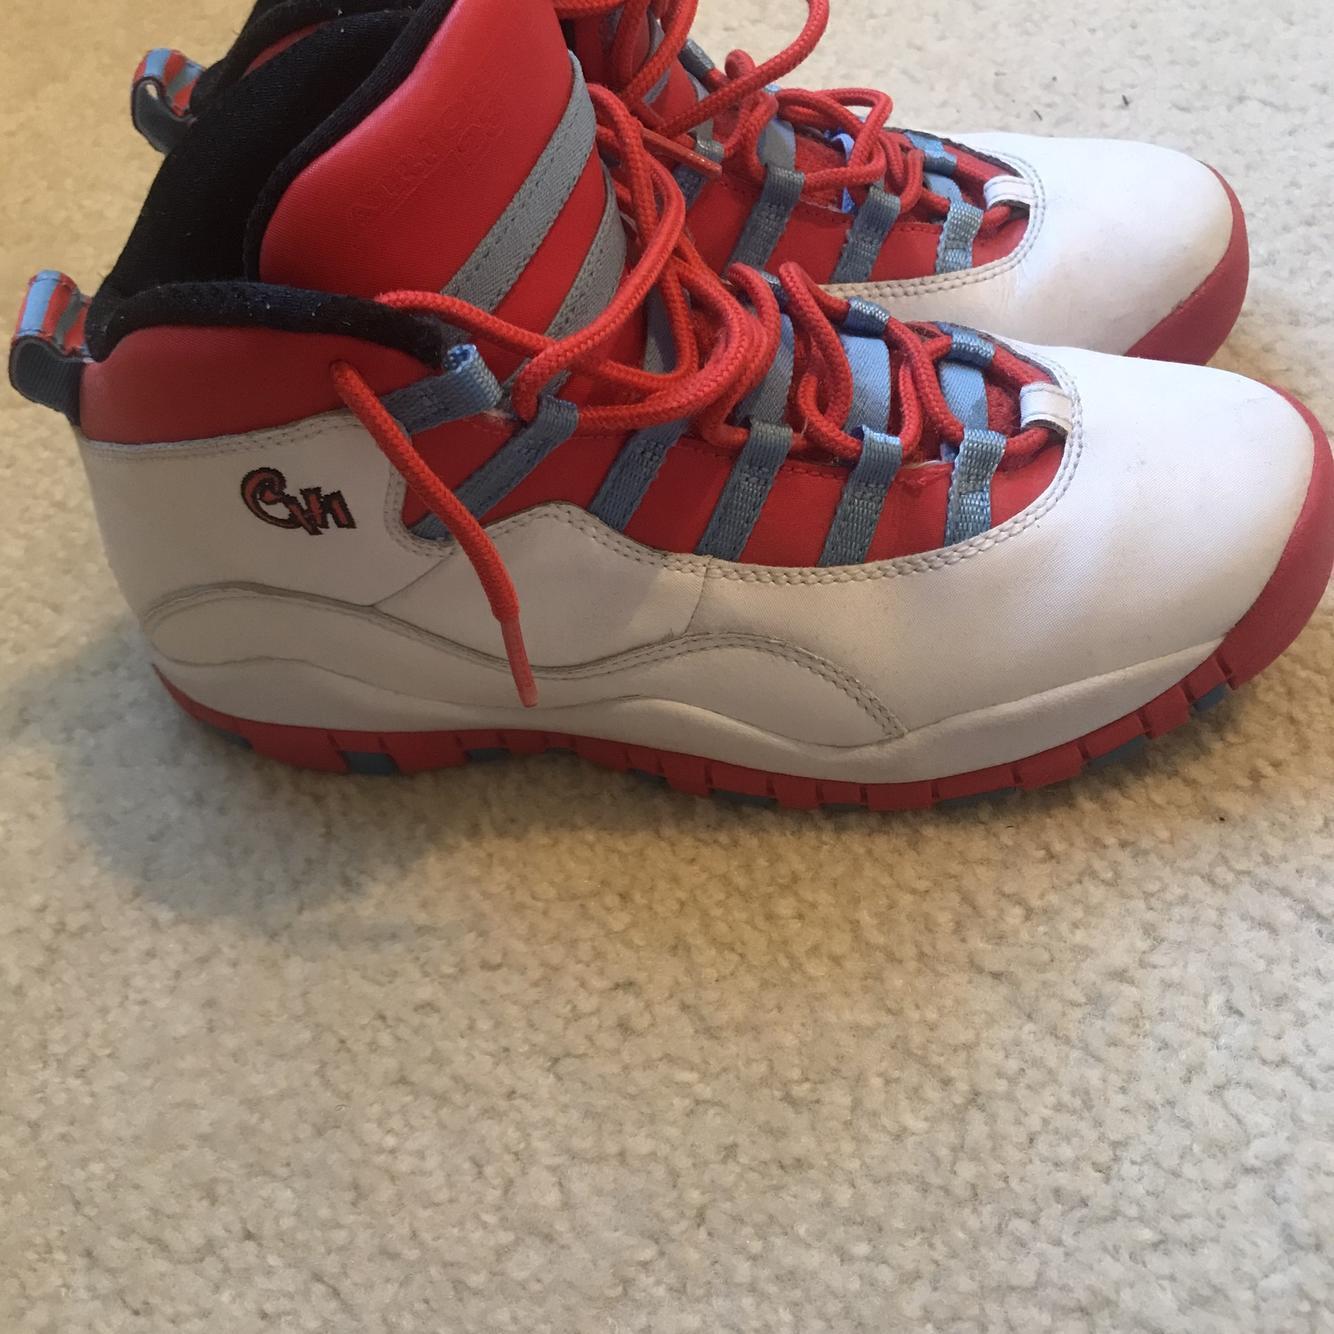 White Kid's Size 6.5 (Women's 7.5) Air Jordan Shoes | SidelineSwap